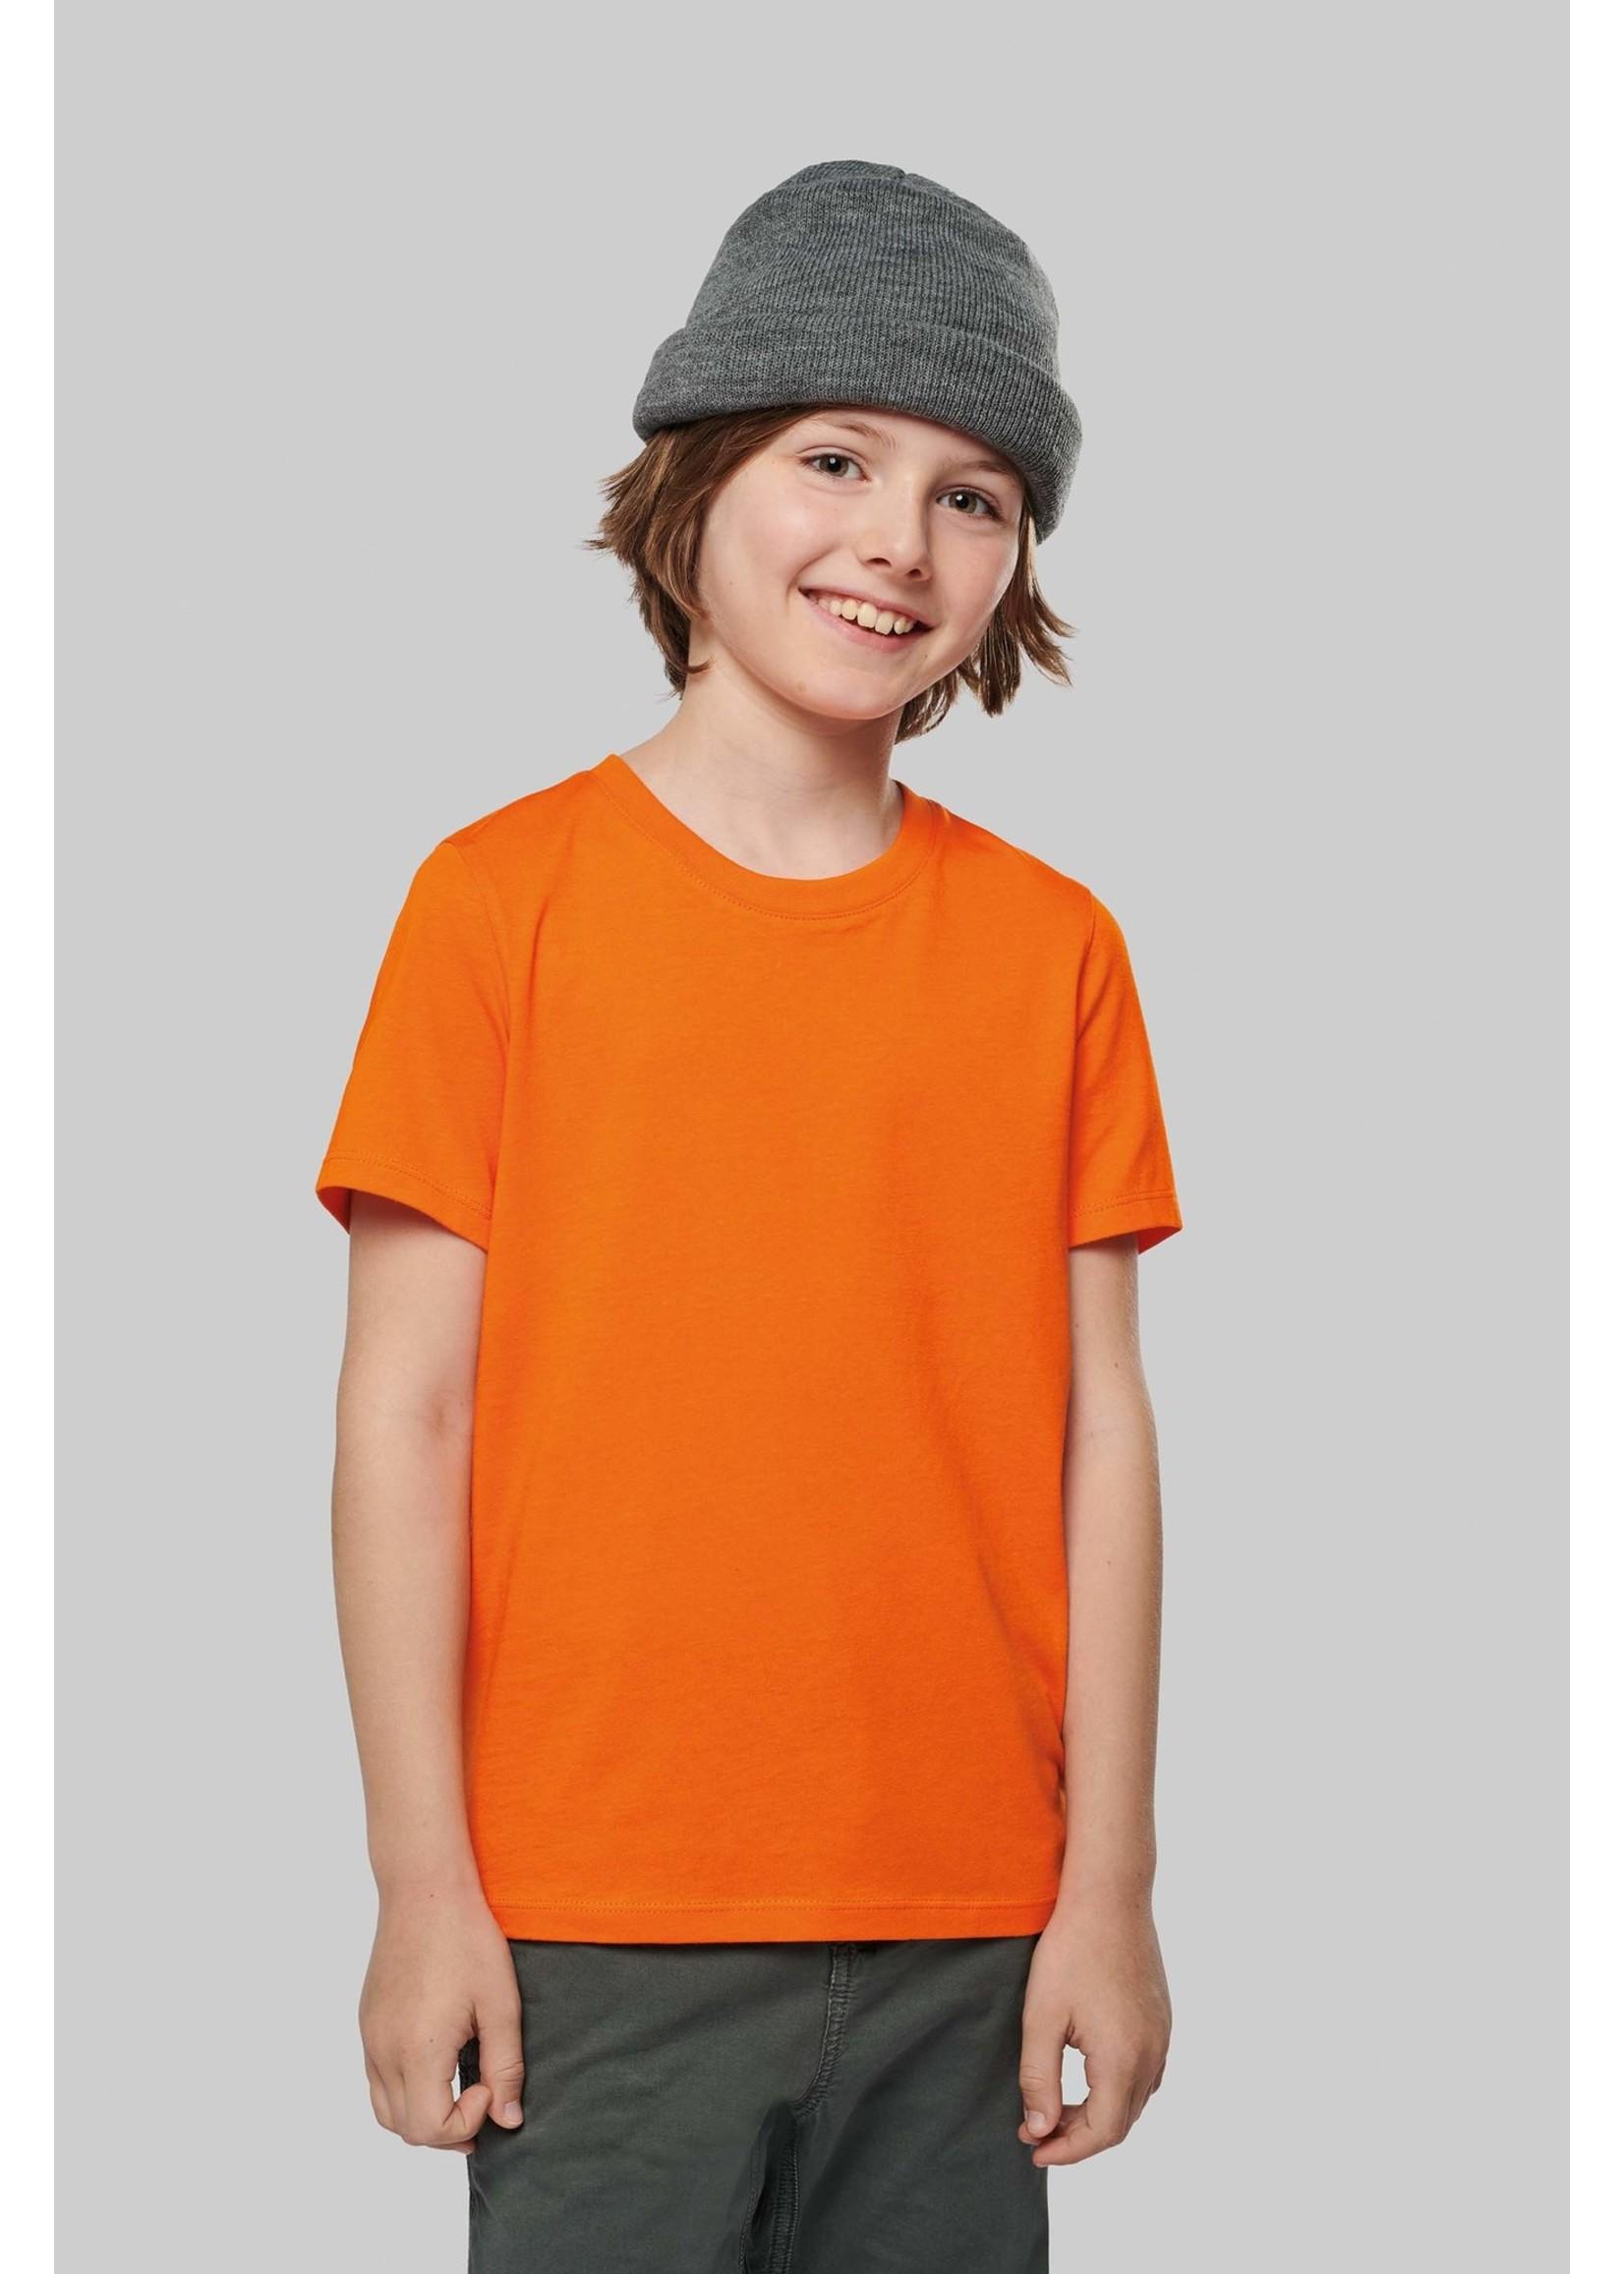 Eco-Friendly KIDS T-shirt - Yellow